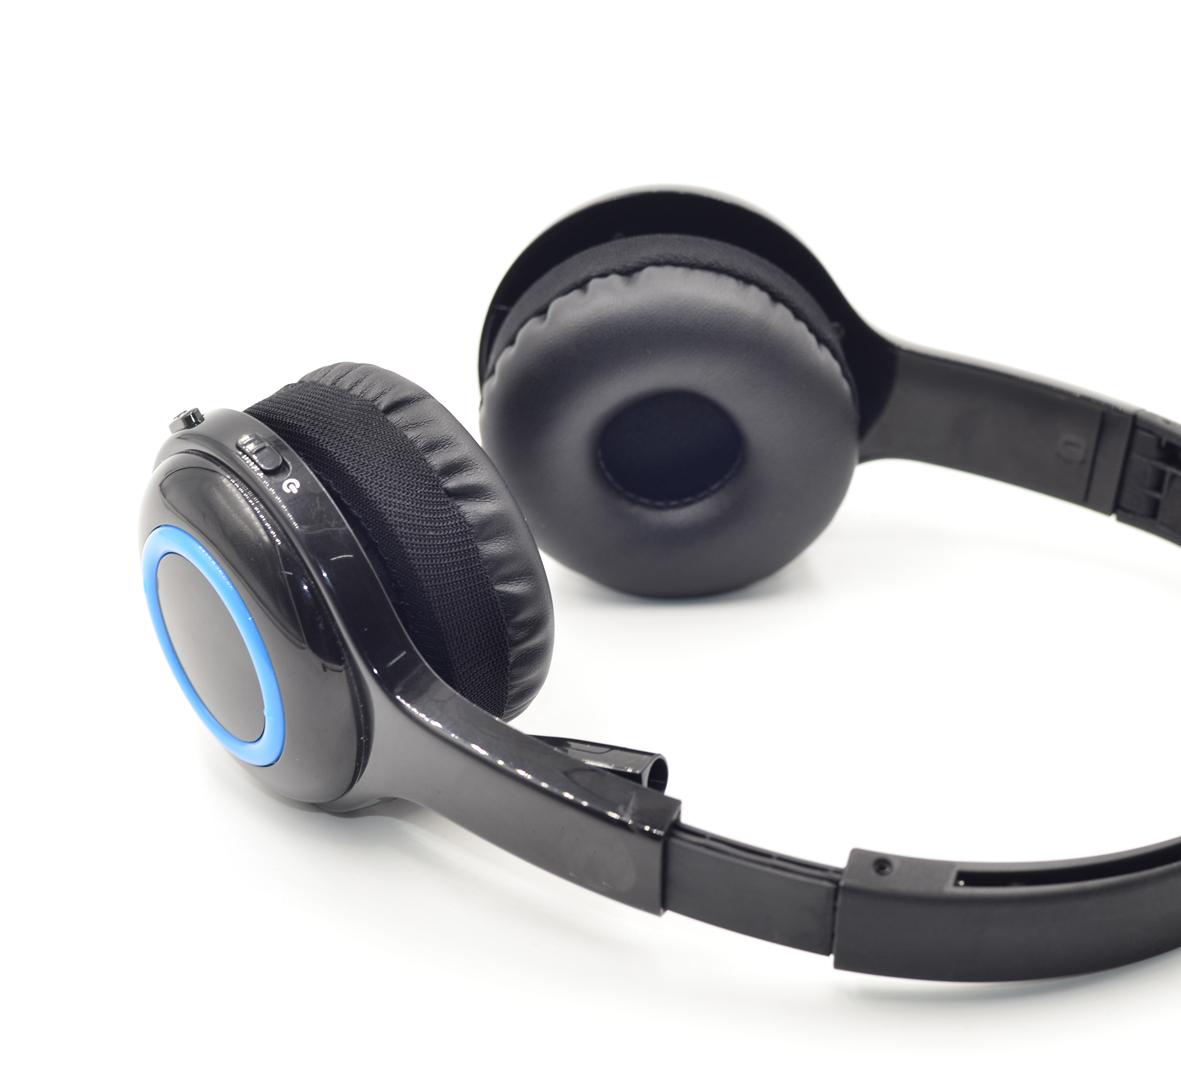 Logitech H760 Wireless Stereo Headset